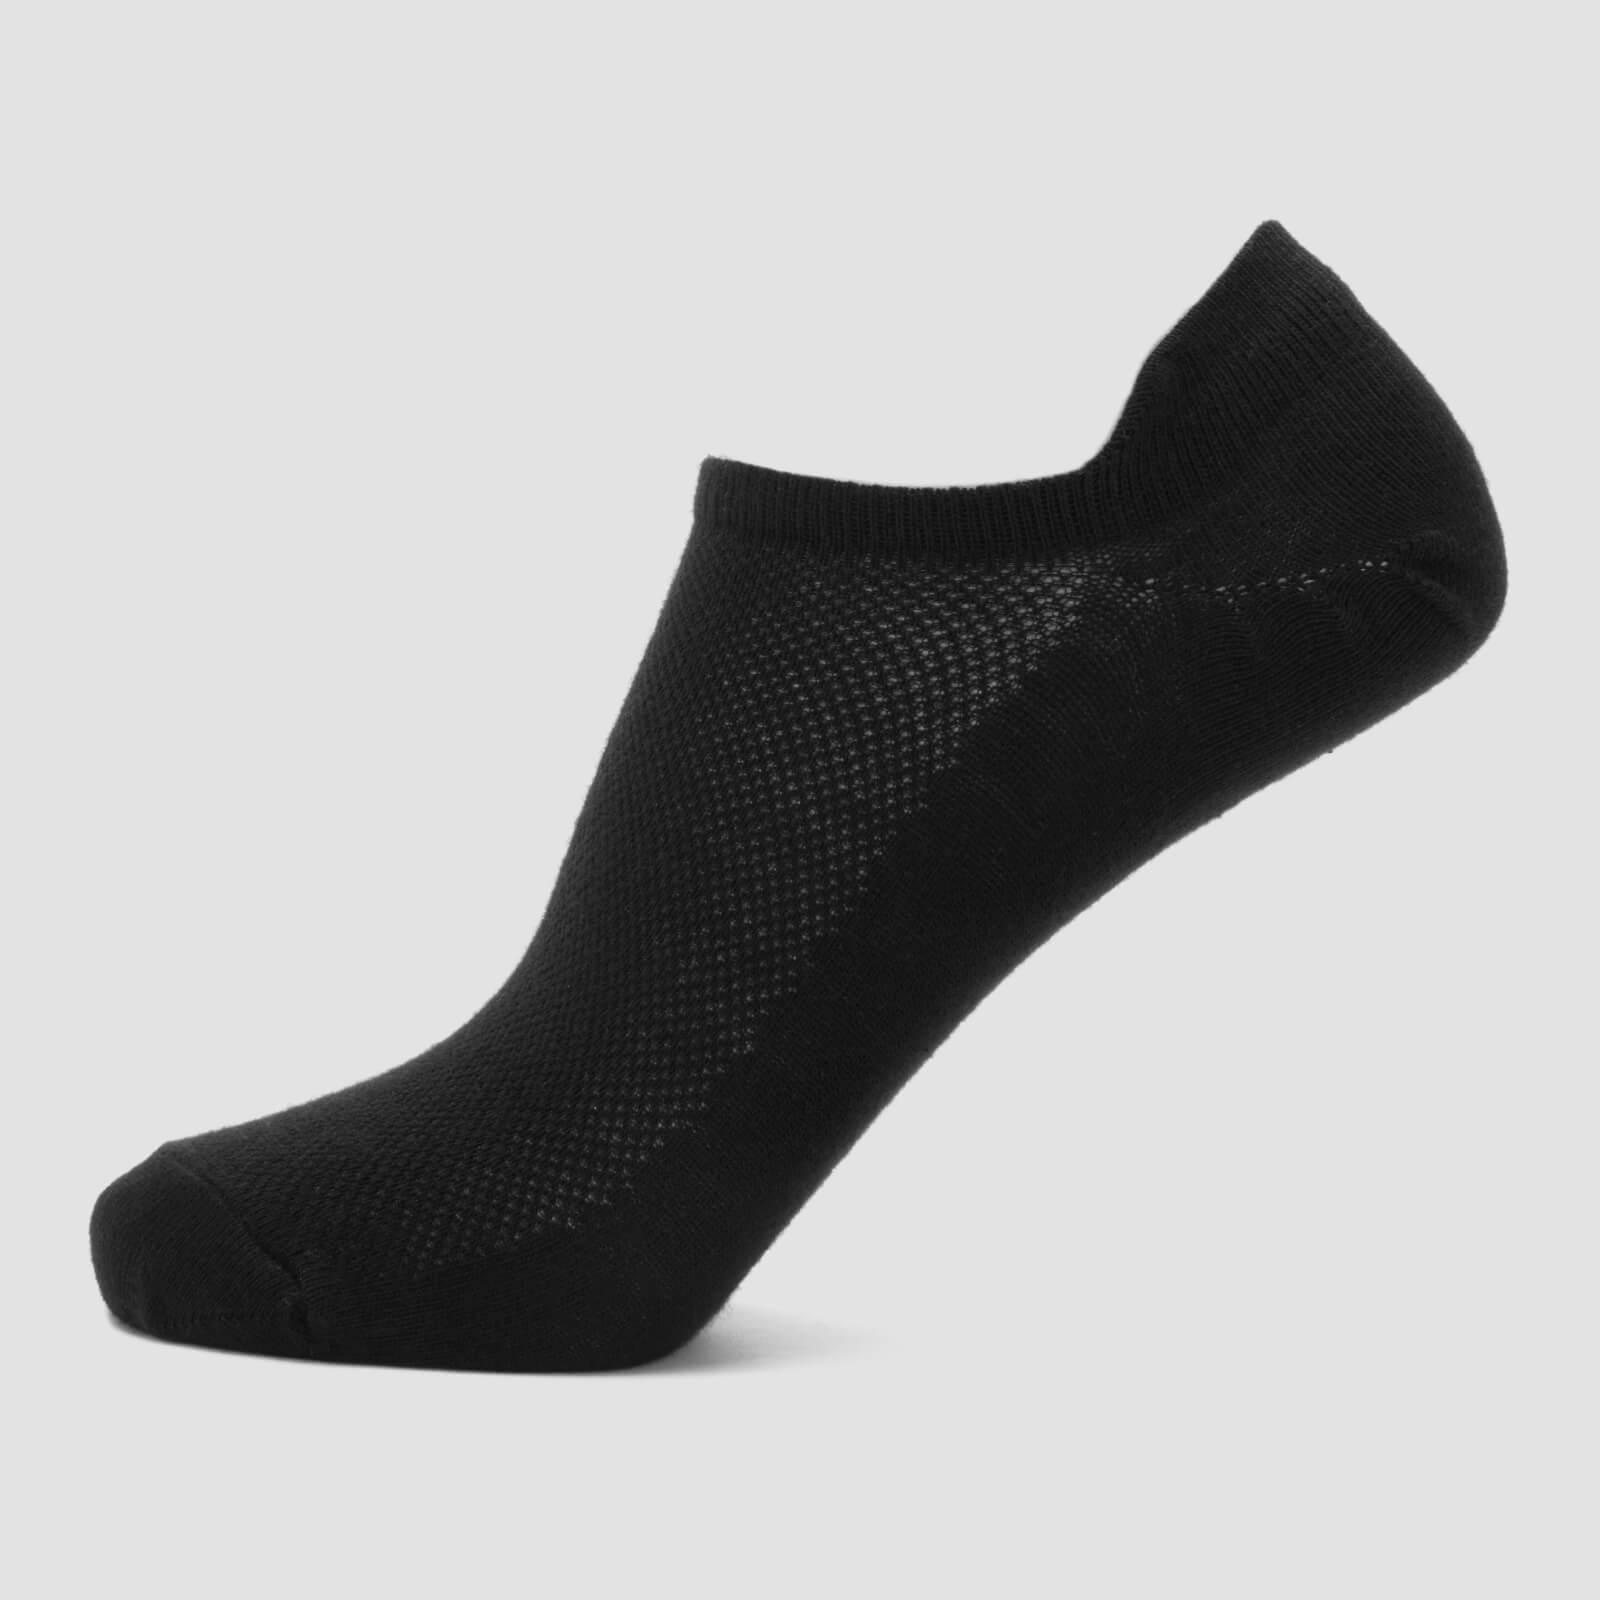 Myprotein MP Essentials Women's Ankle Socks - Black (3 Pack) - UK 7-9